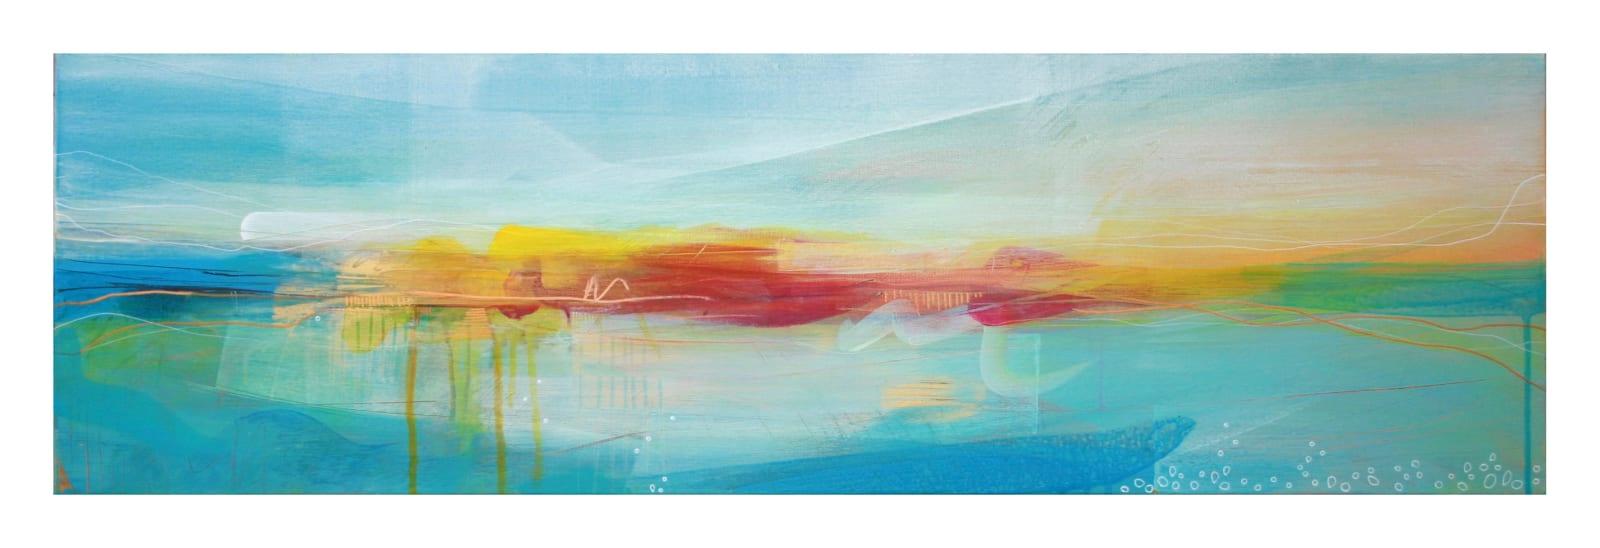 Victoria Wylie, Infinite Sunrise, Lunan Bay